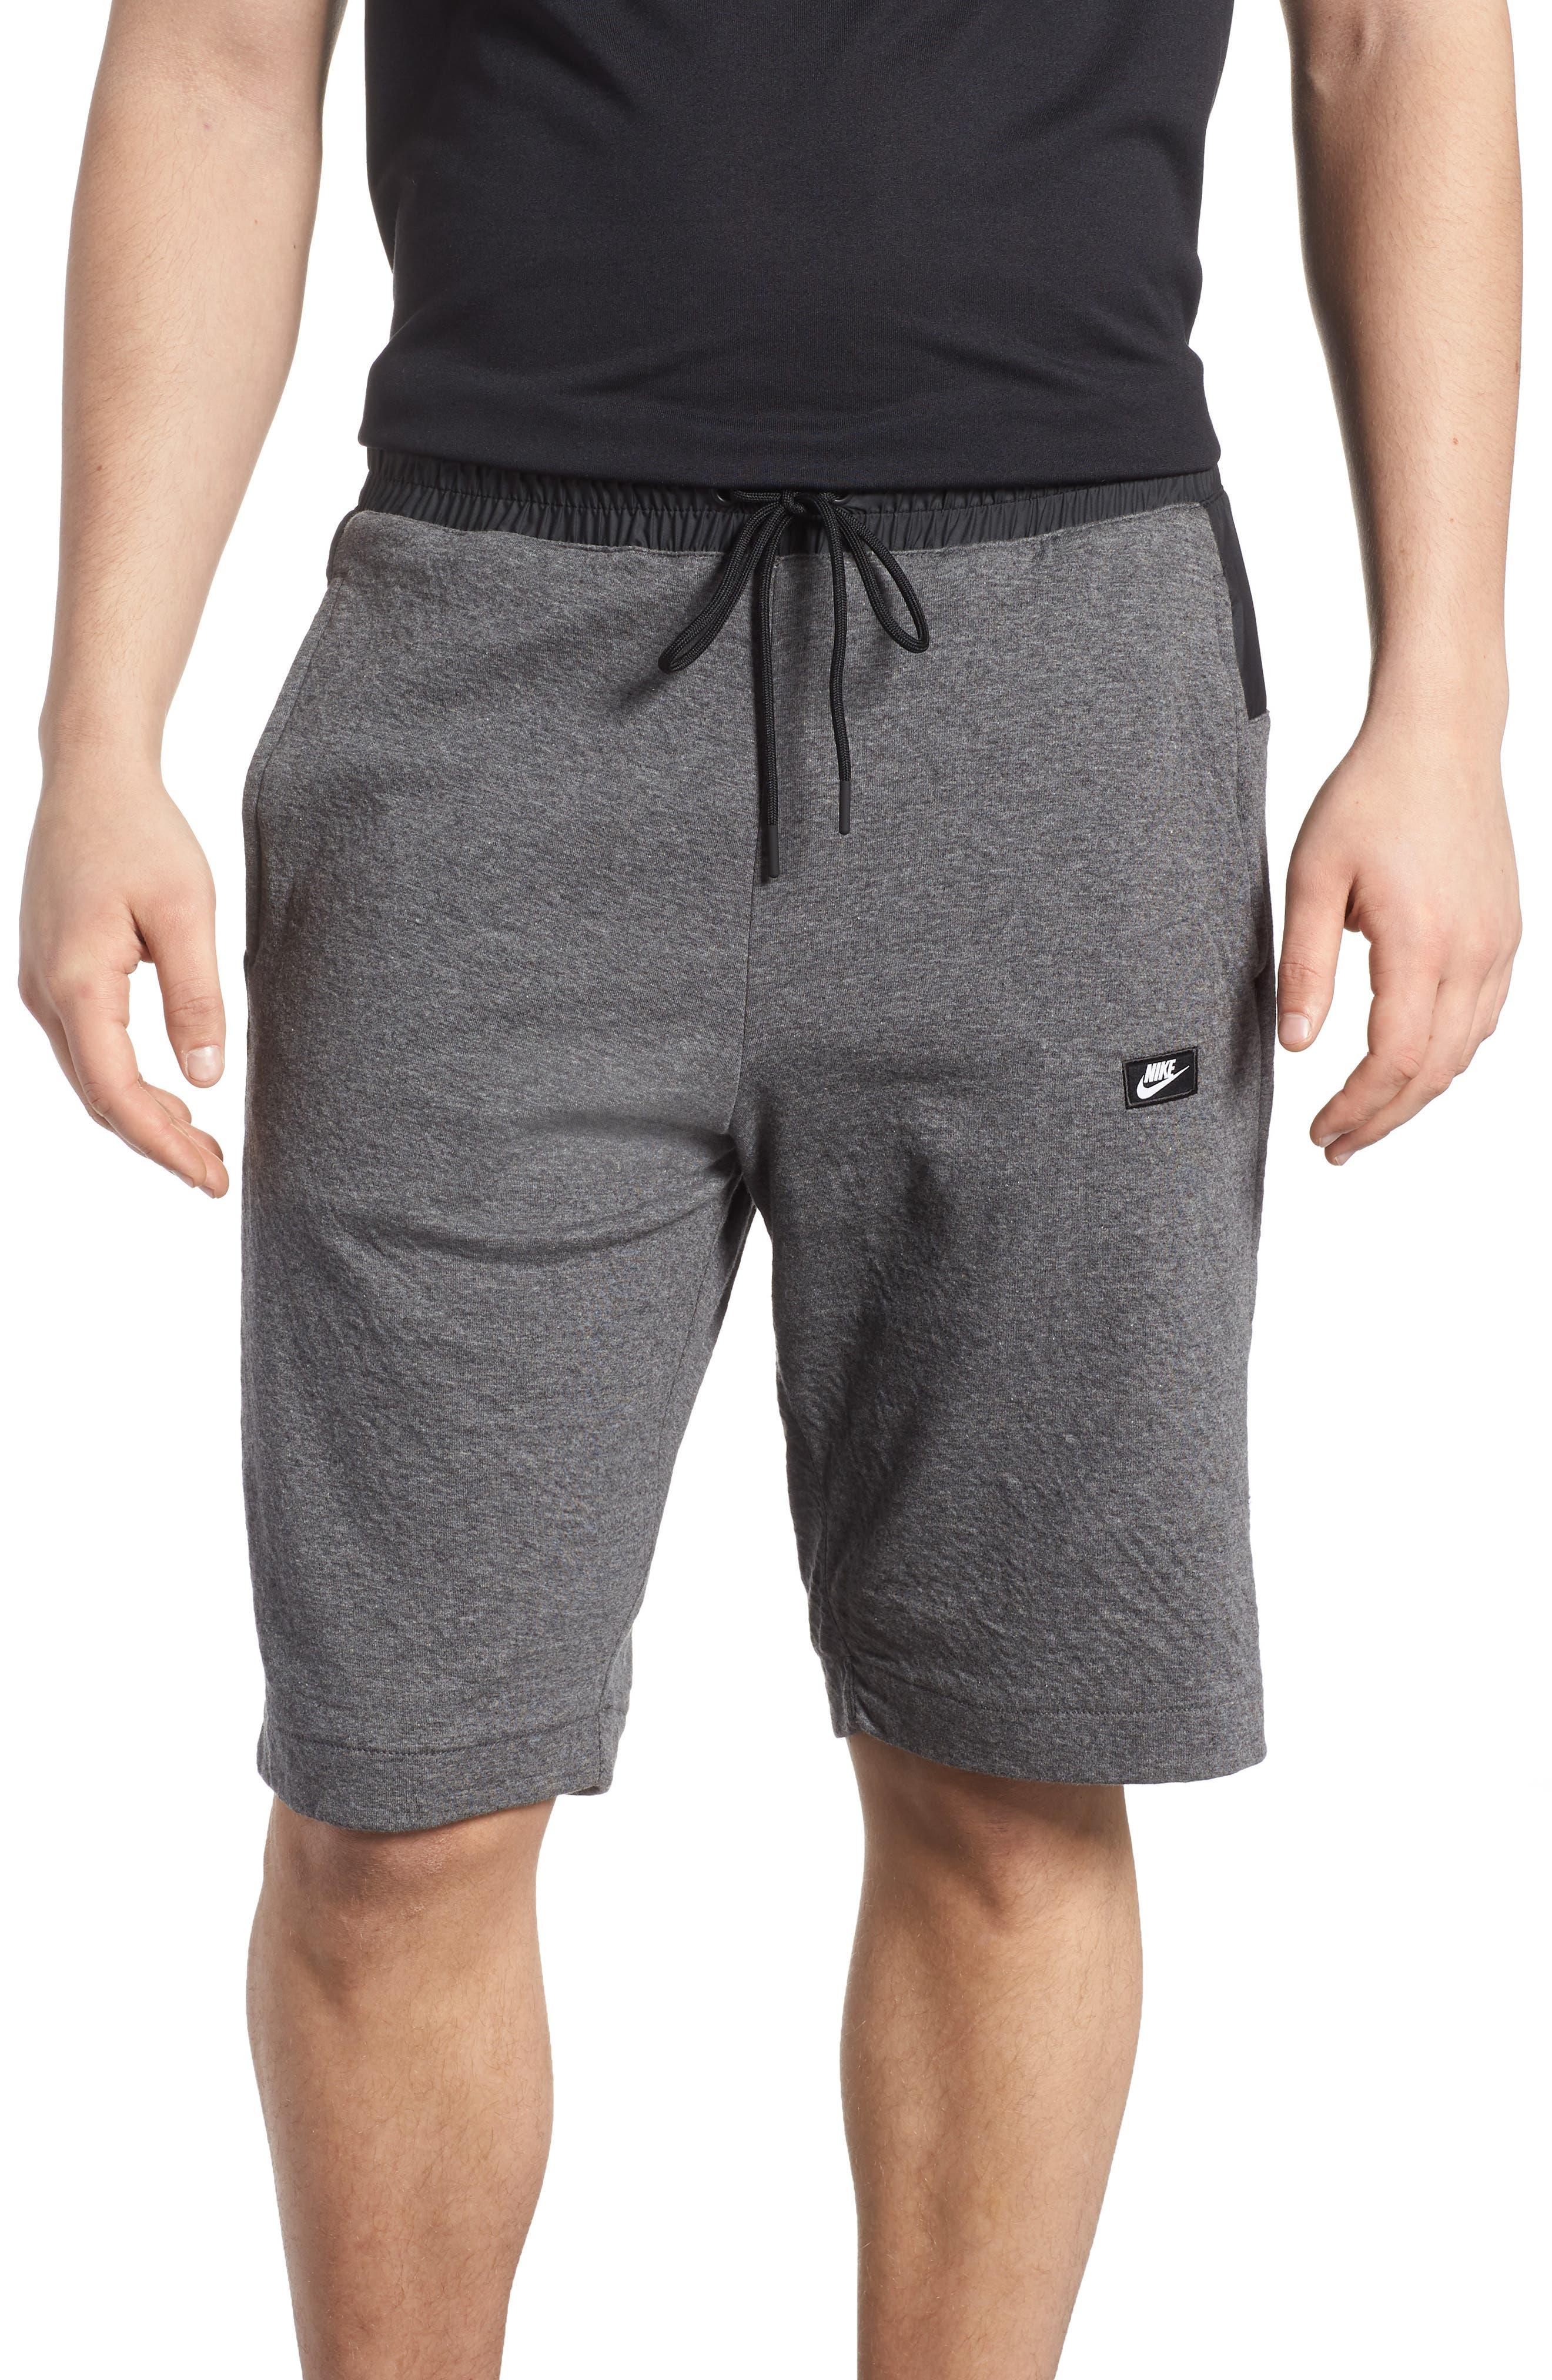 Sportswear Modern Shorts,                             Main thumbnail 1, color,                             Charcoal Heather/ Black